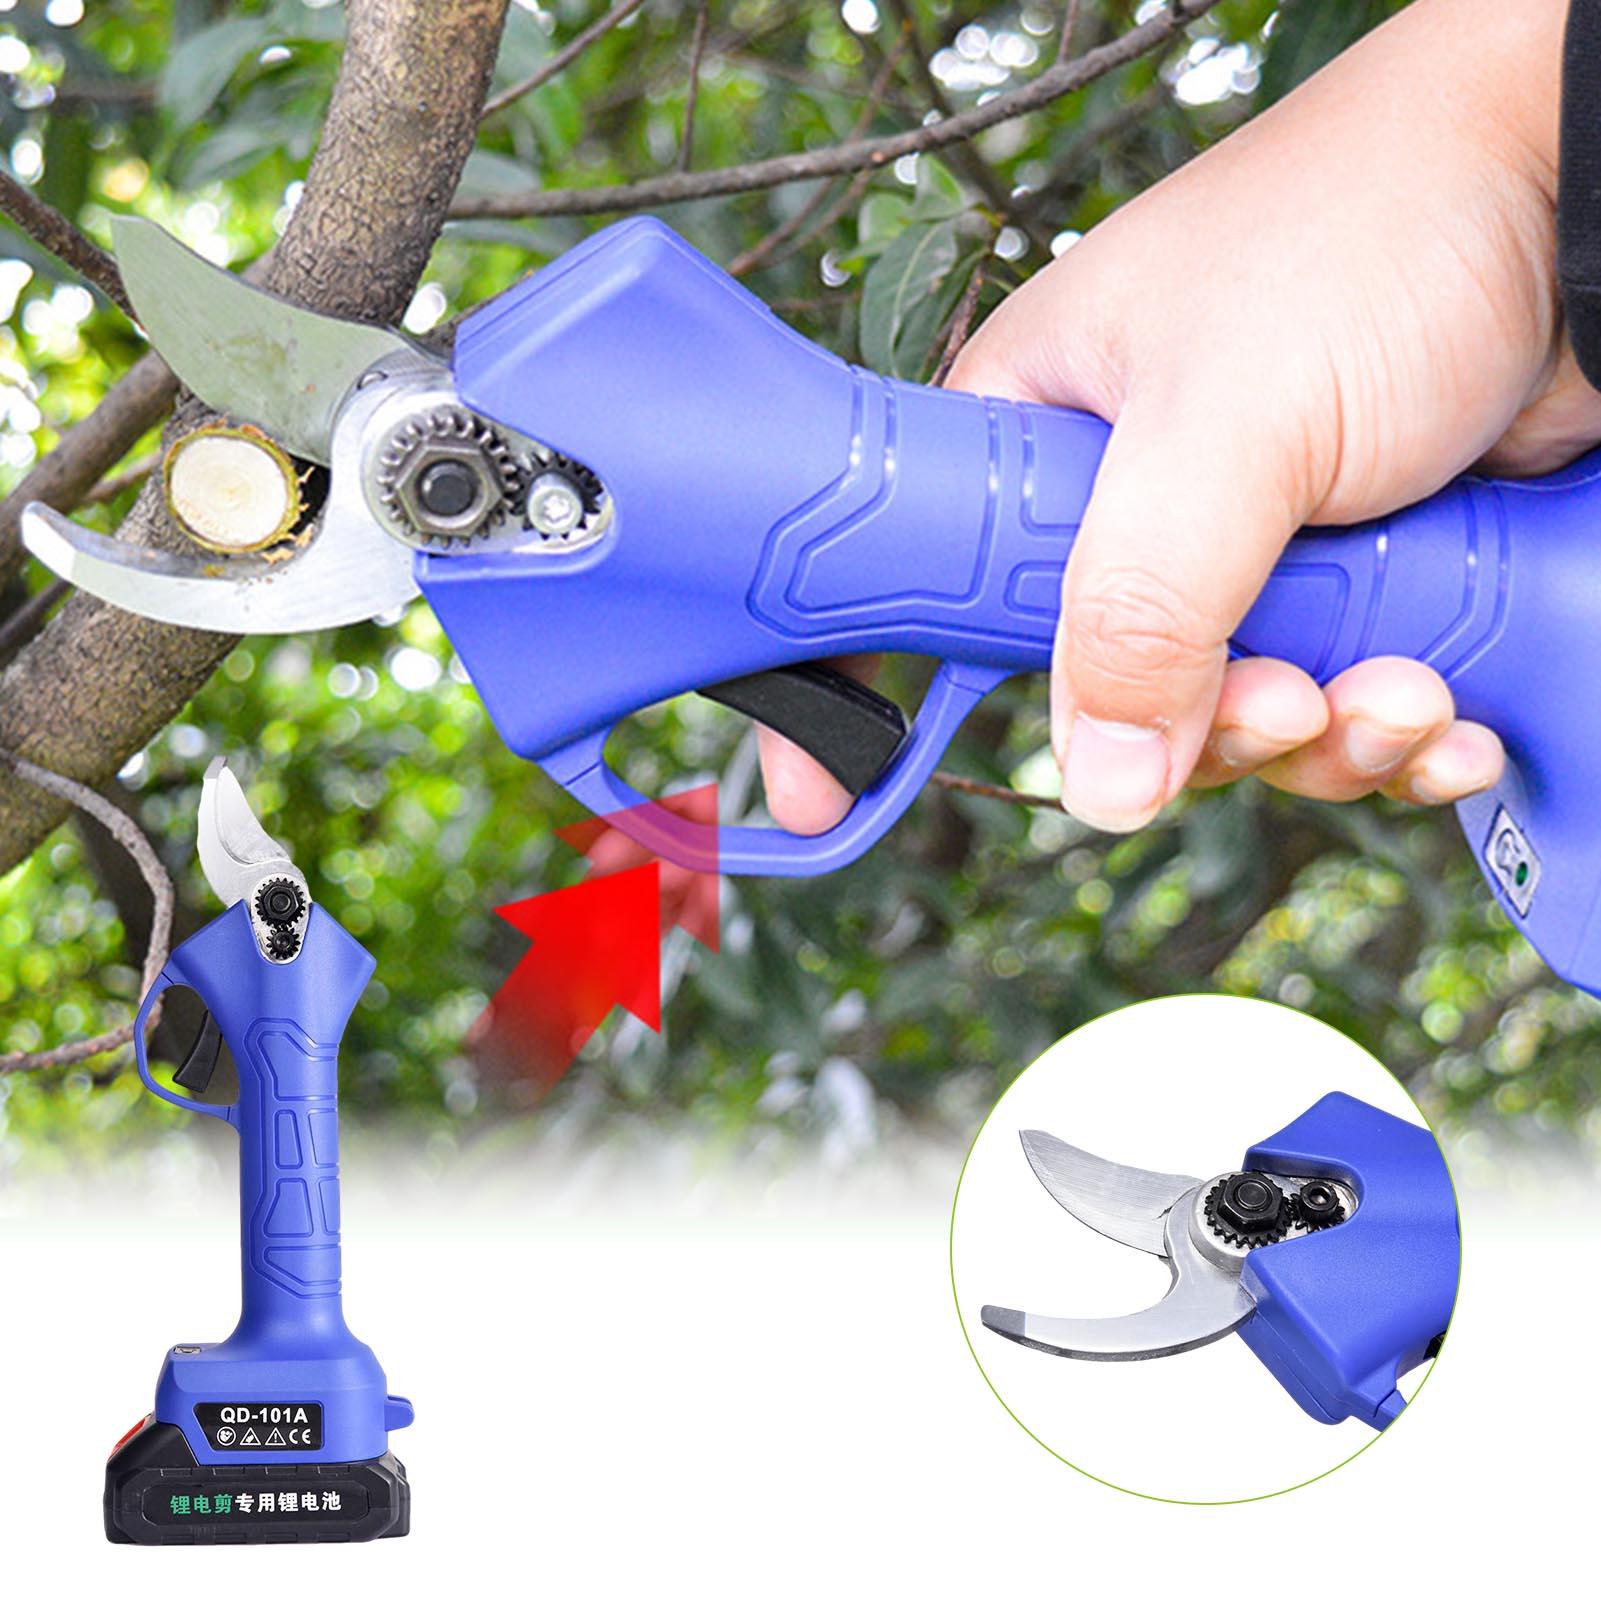 Electric Pruning Shear Cordless Secateurs 2PCS Lithium Battery Pruner Fruit Tree Branch Trimmer Cutter Scissor Garden Power Tool